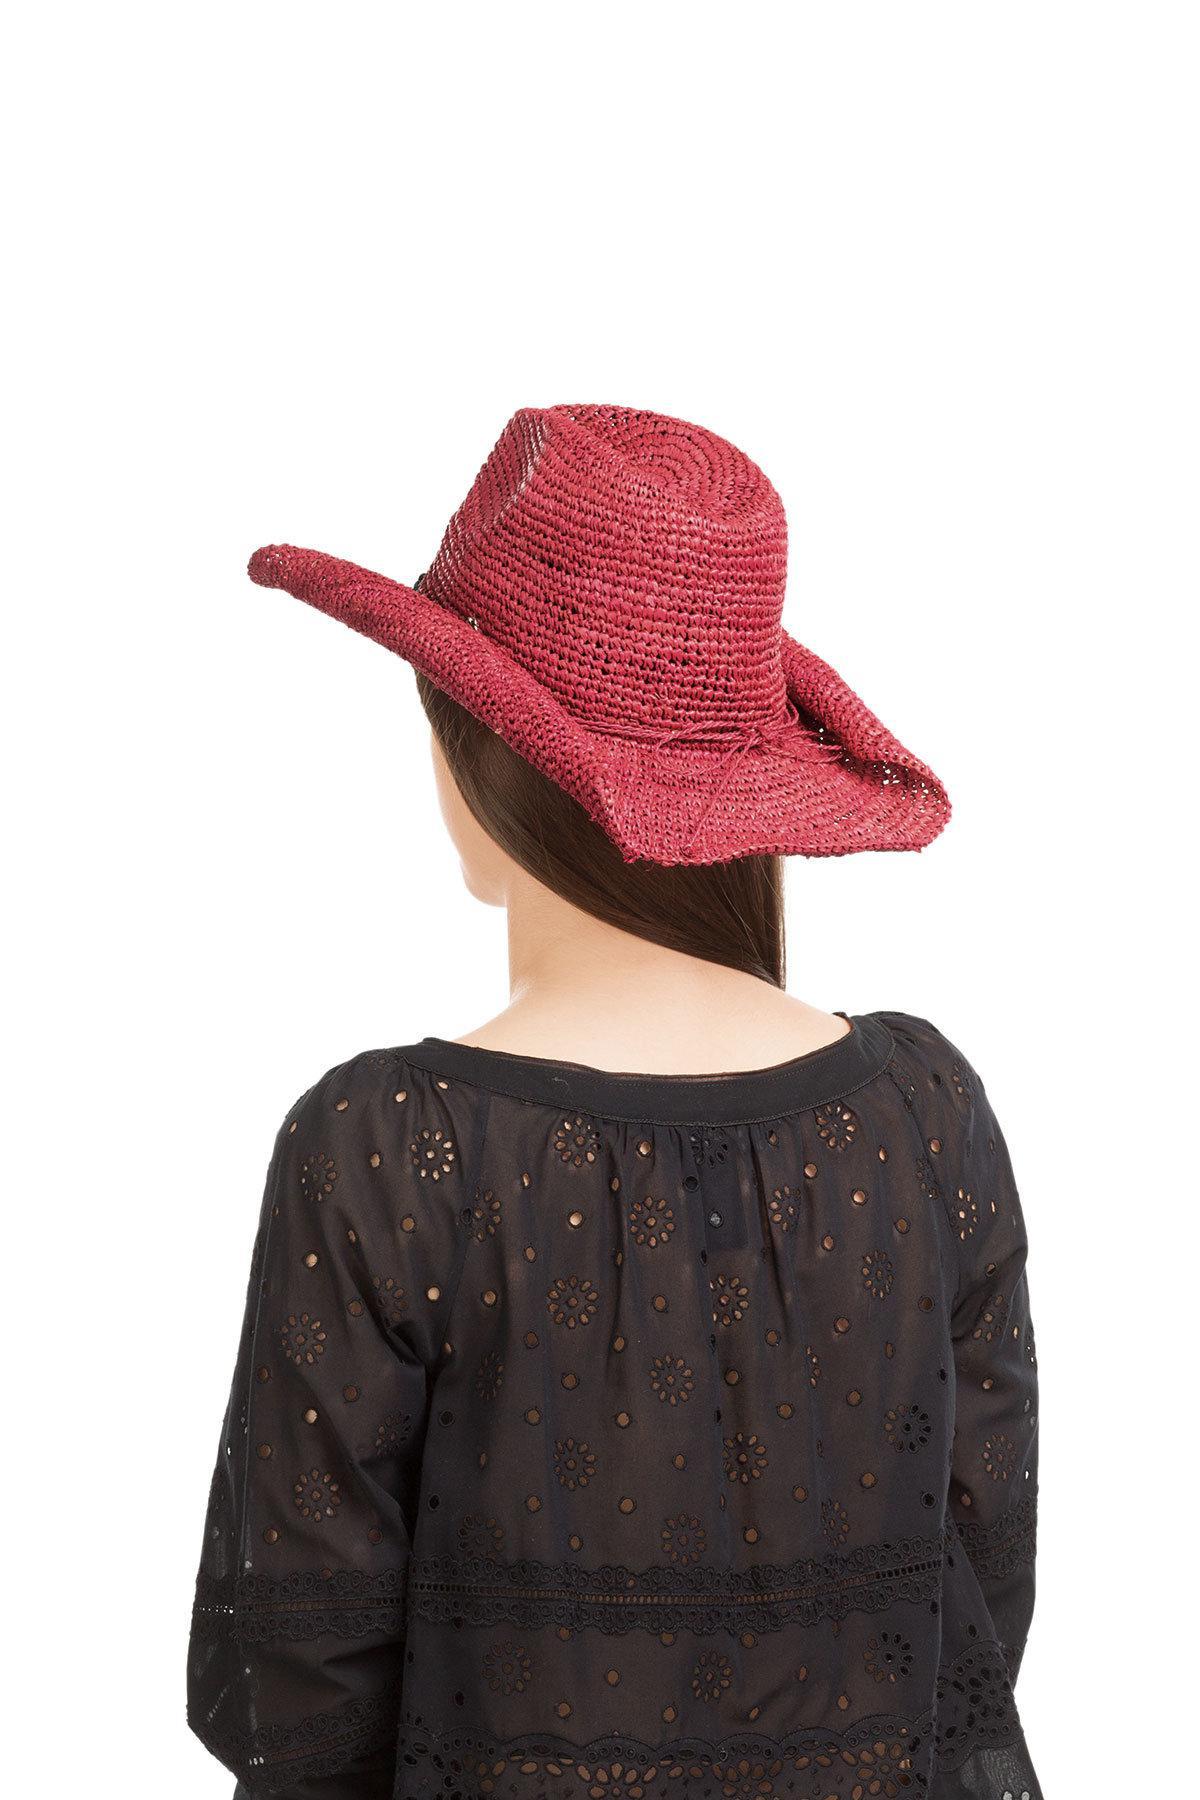 Florabella Raffia Hat in Pink - Lyst 0c413636aa3e